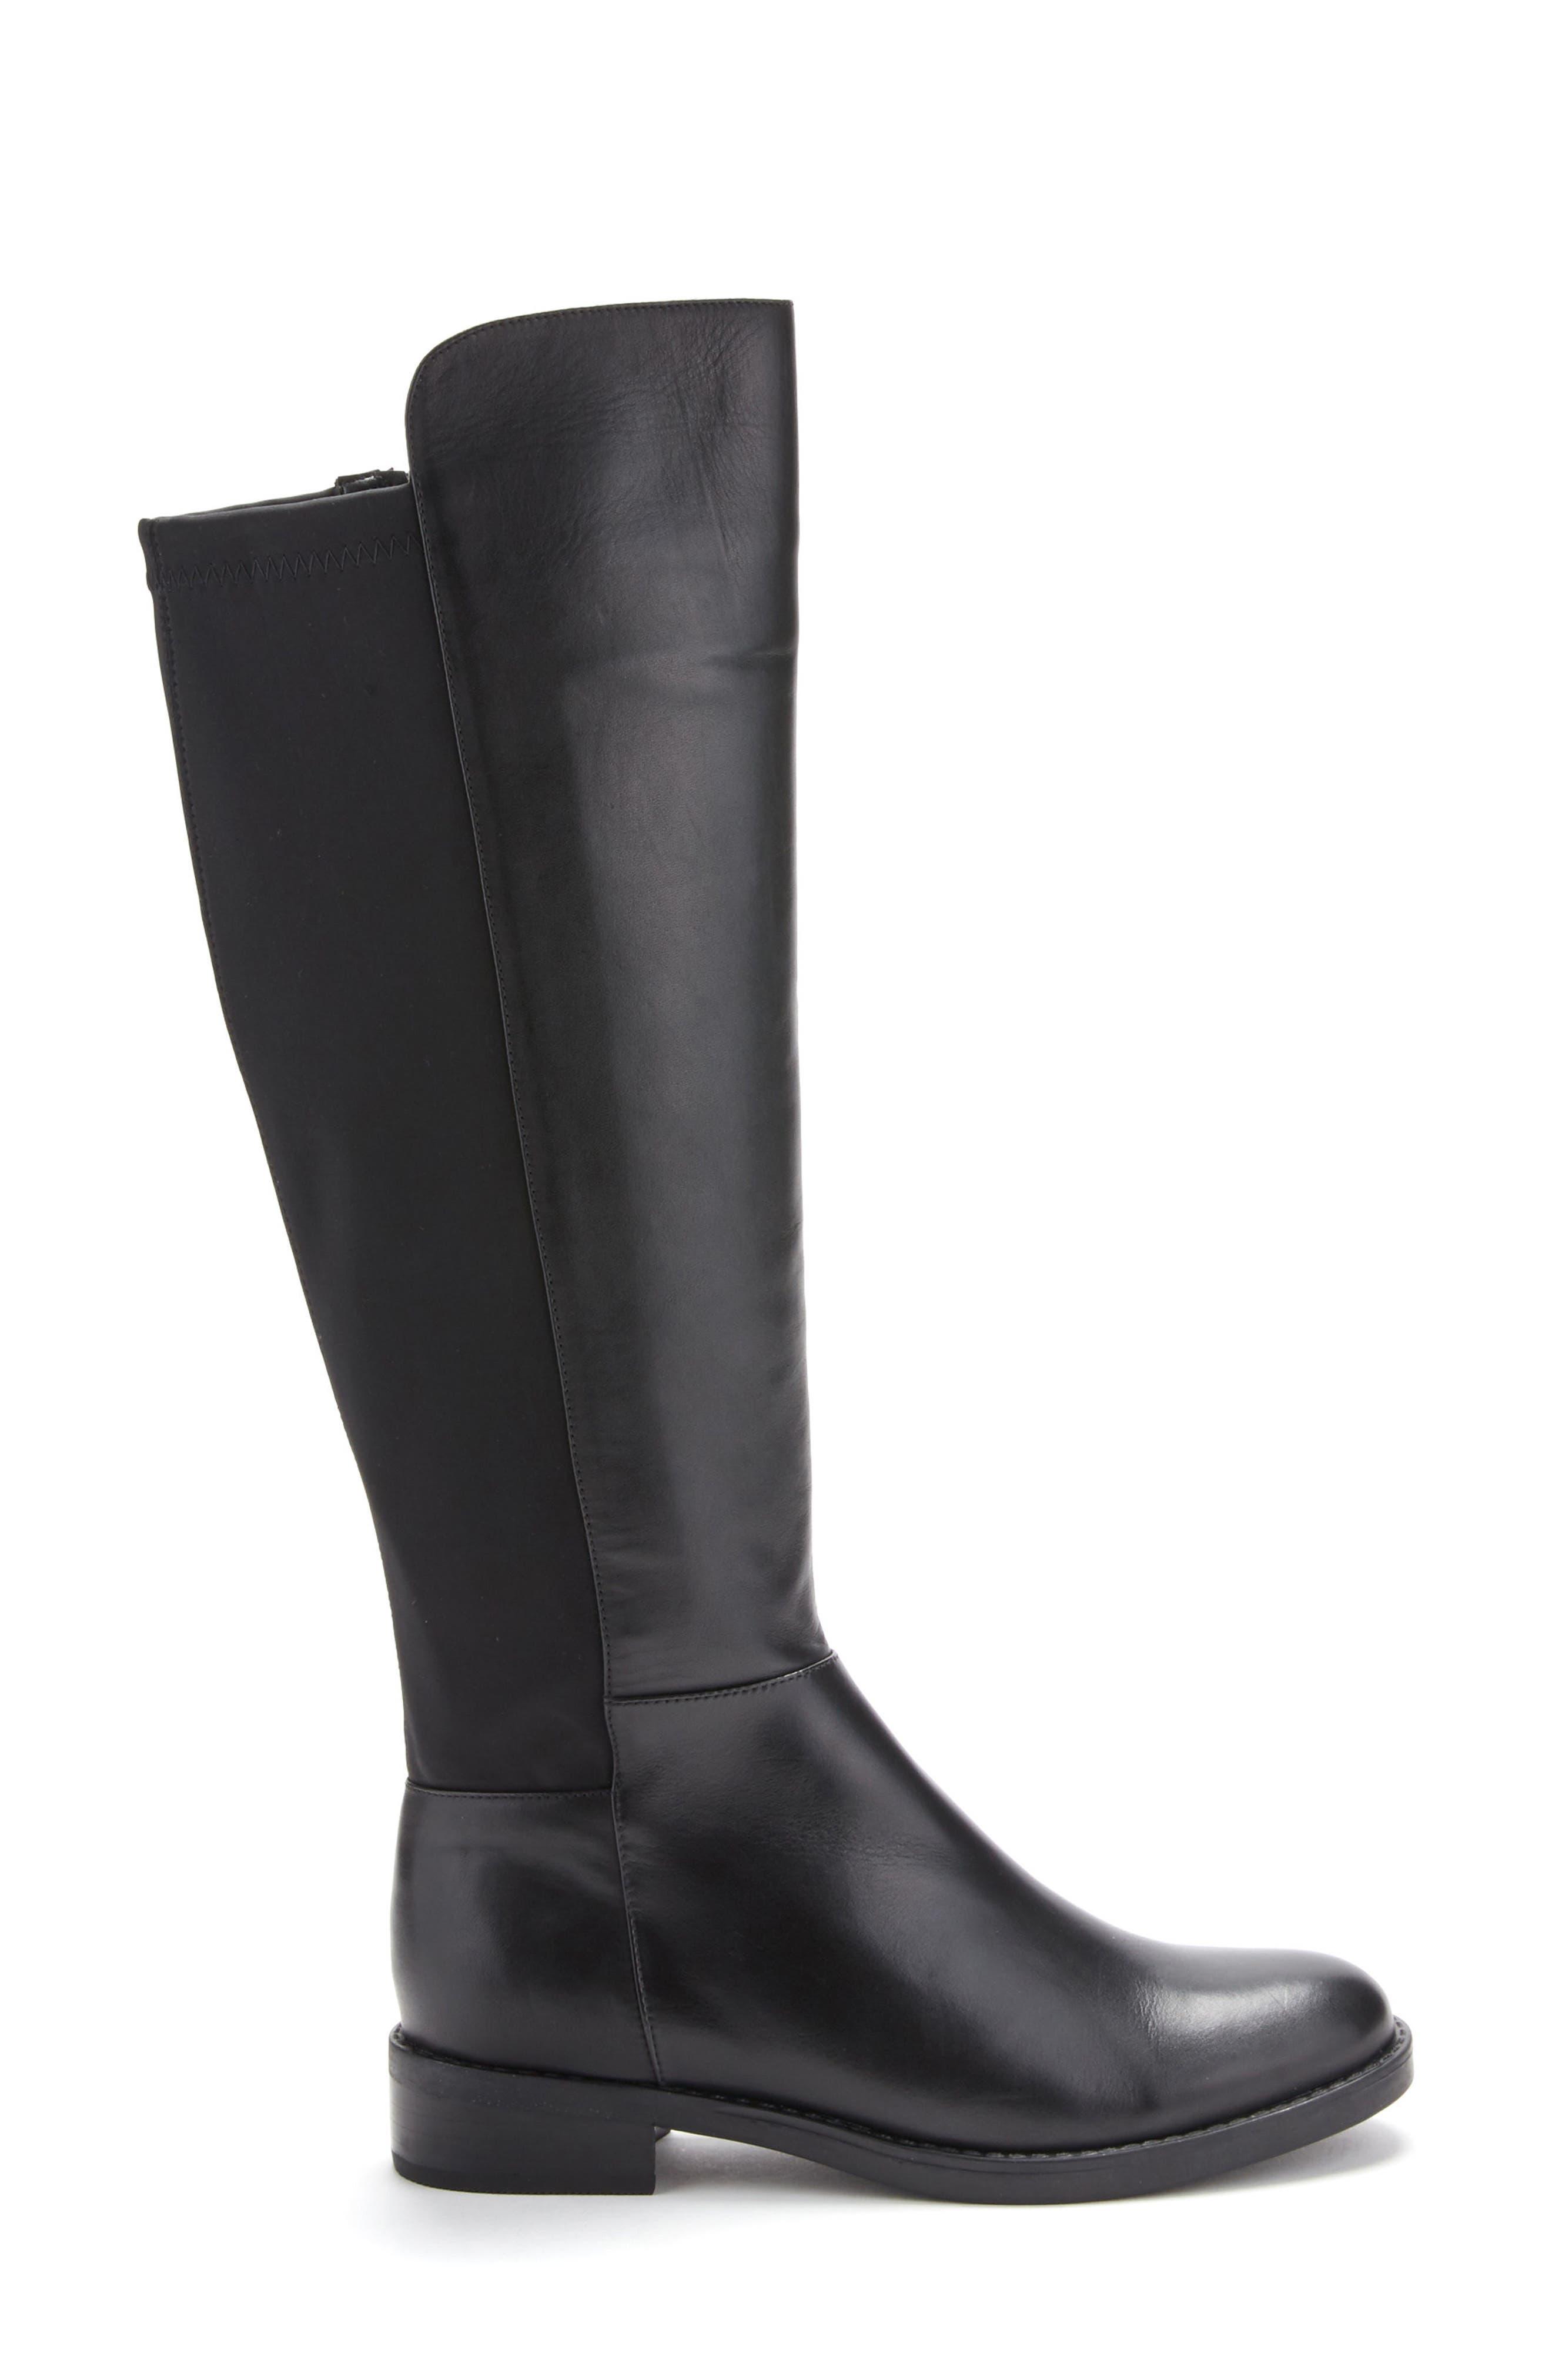 Ellie Waterproof Knee High Riding Boot,                             Alternate thumbnail 3, color,                             BLACK LEATHER